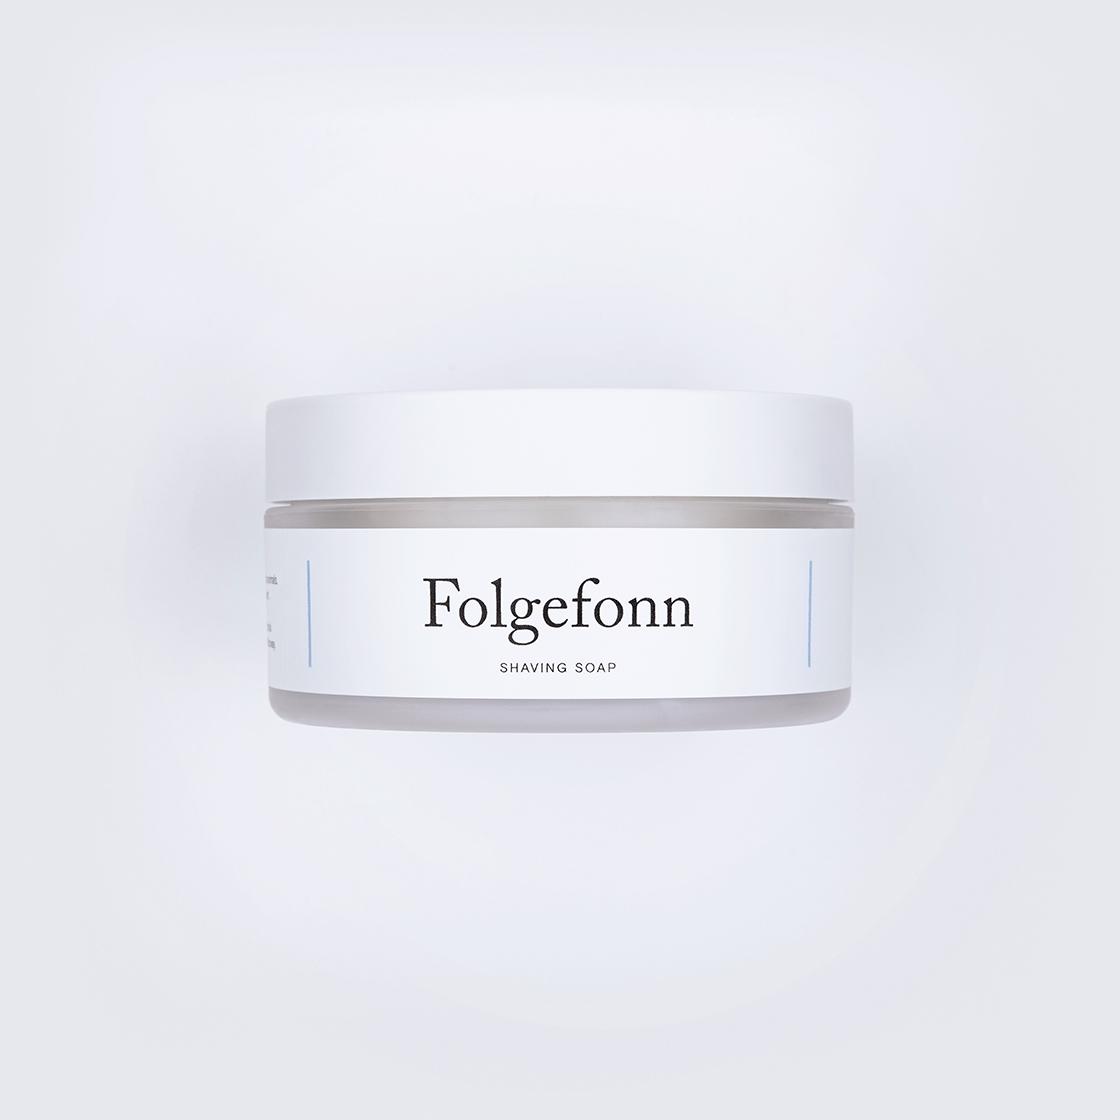 Fitjar Islands - Folgefonn - Soap image